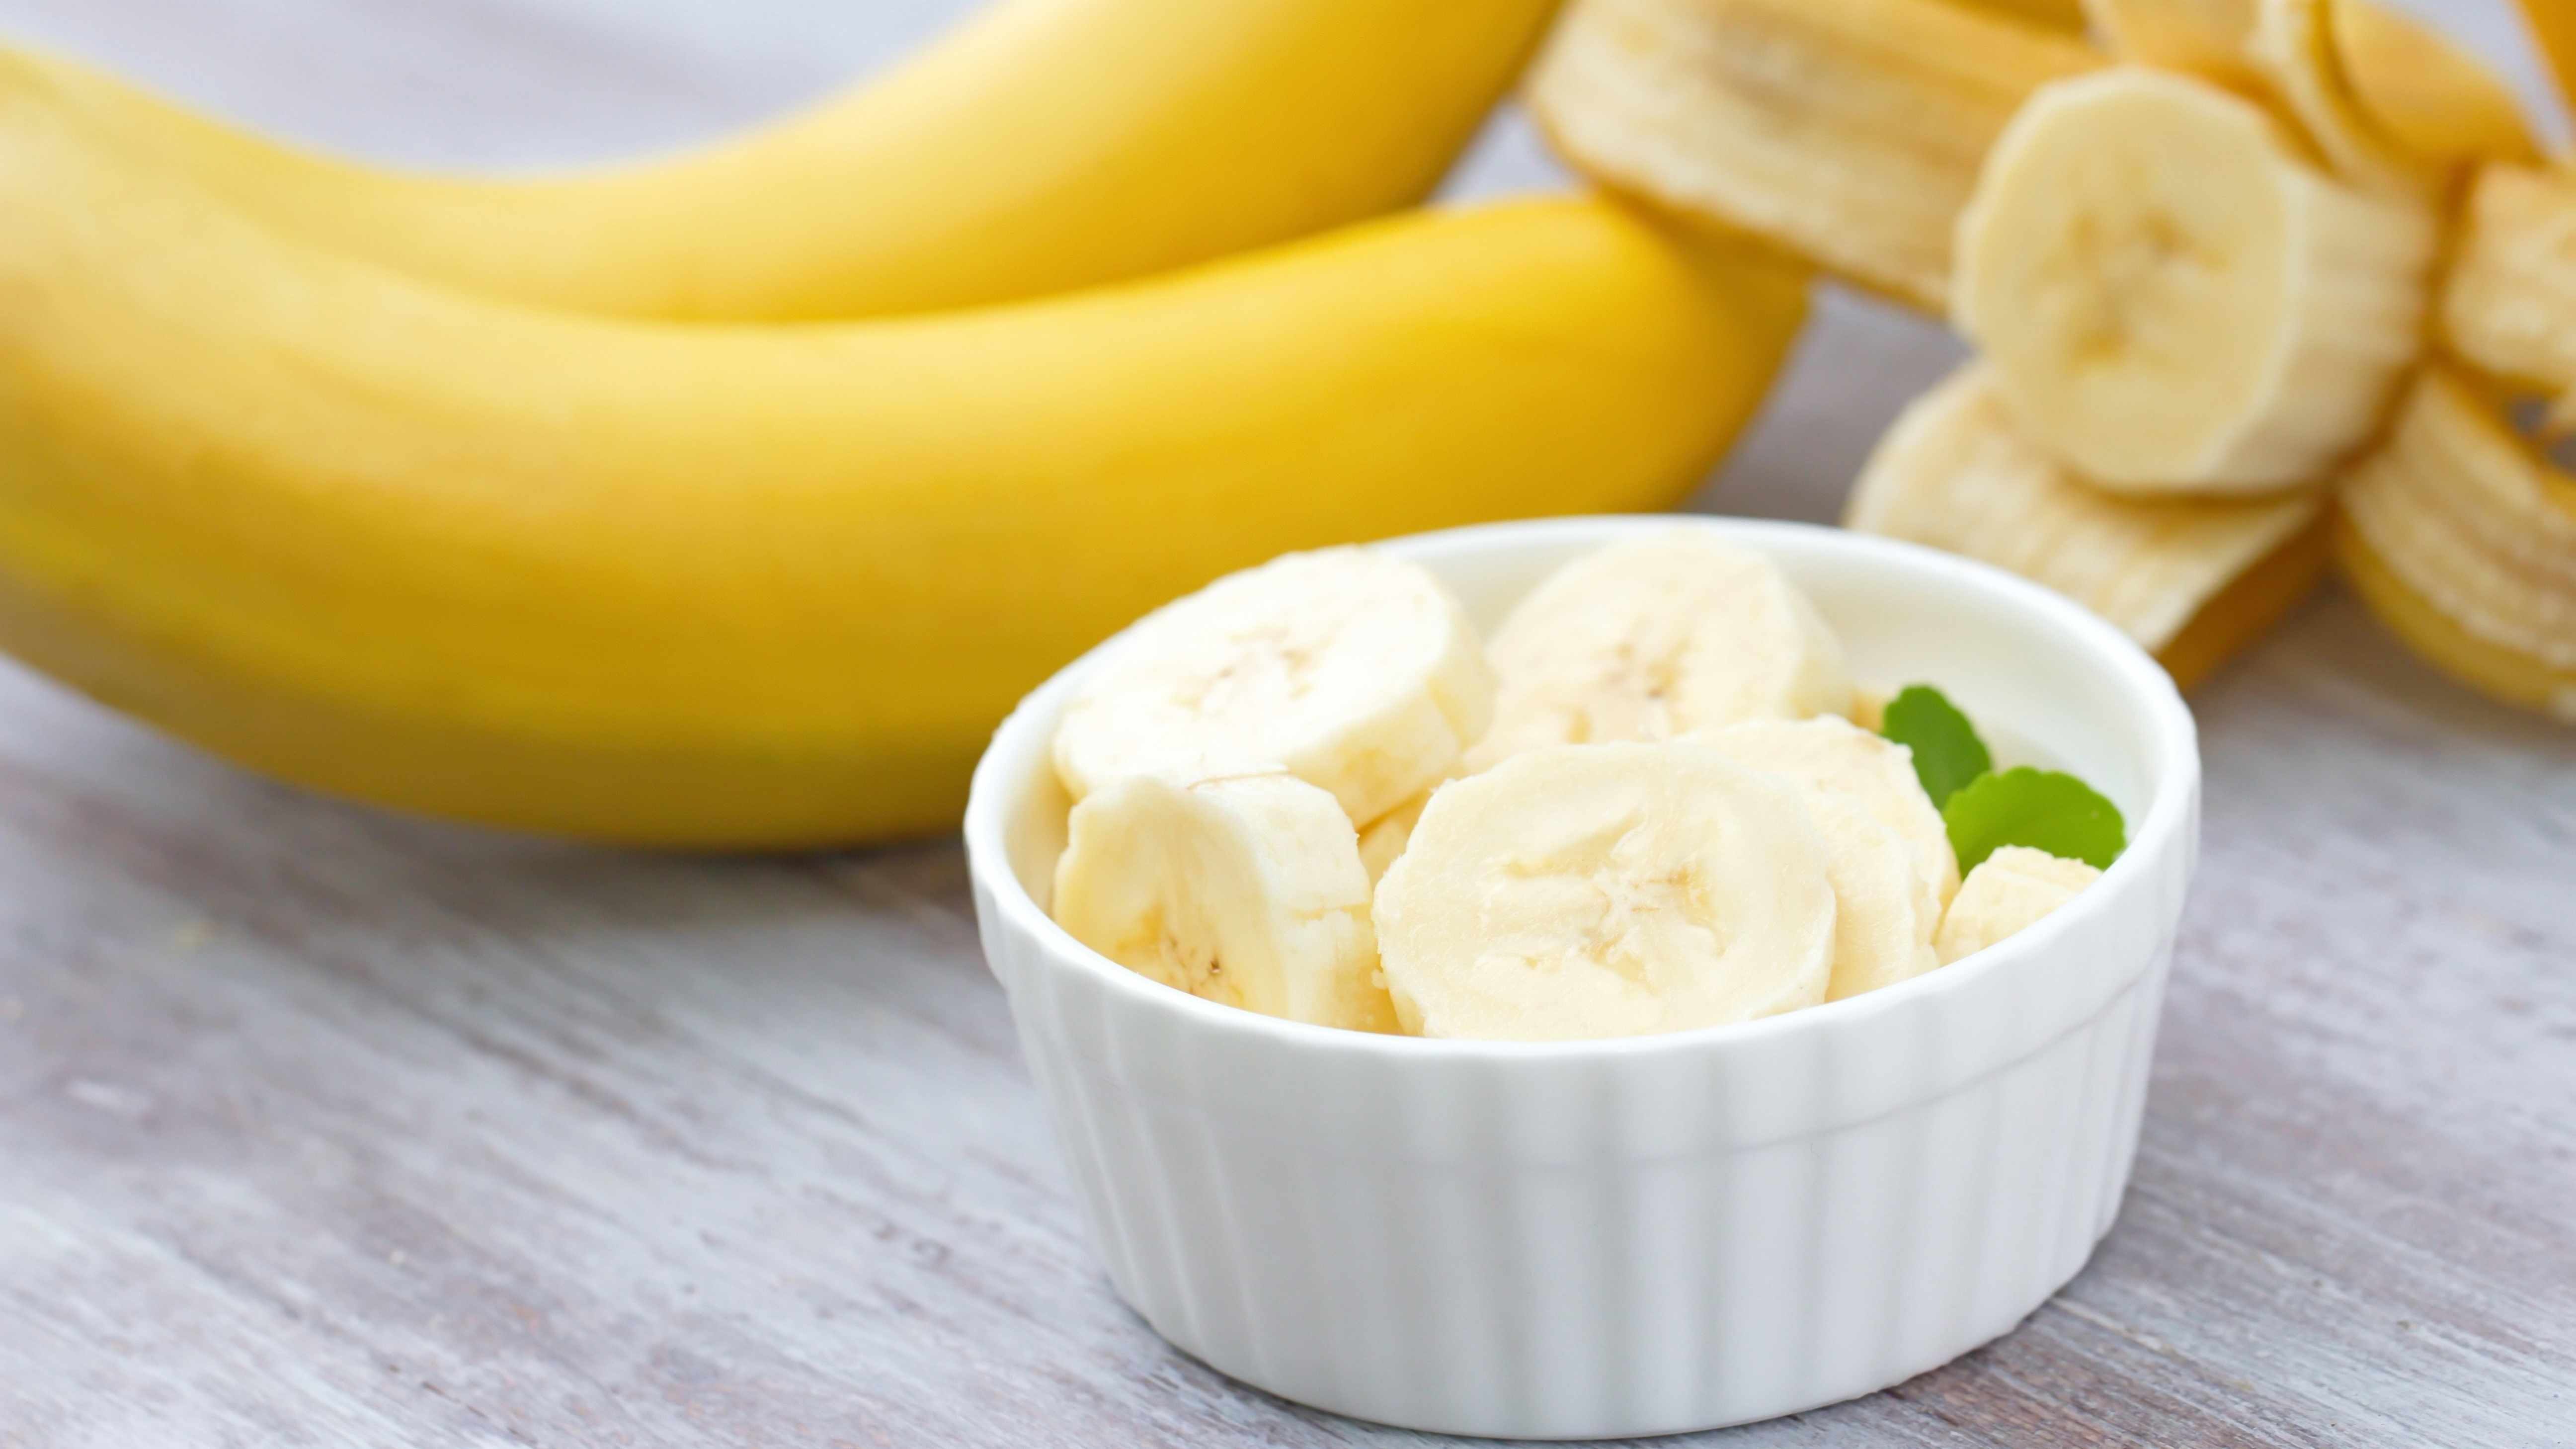 Bananas And Diabetes Mayo Clinic